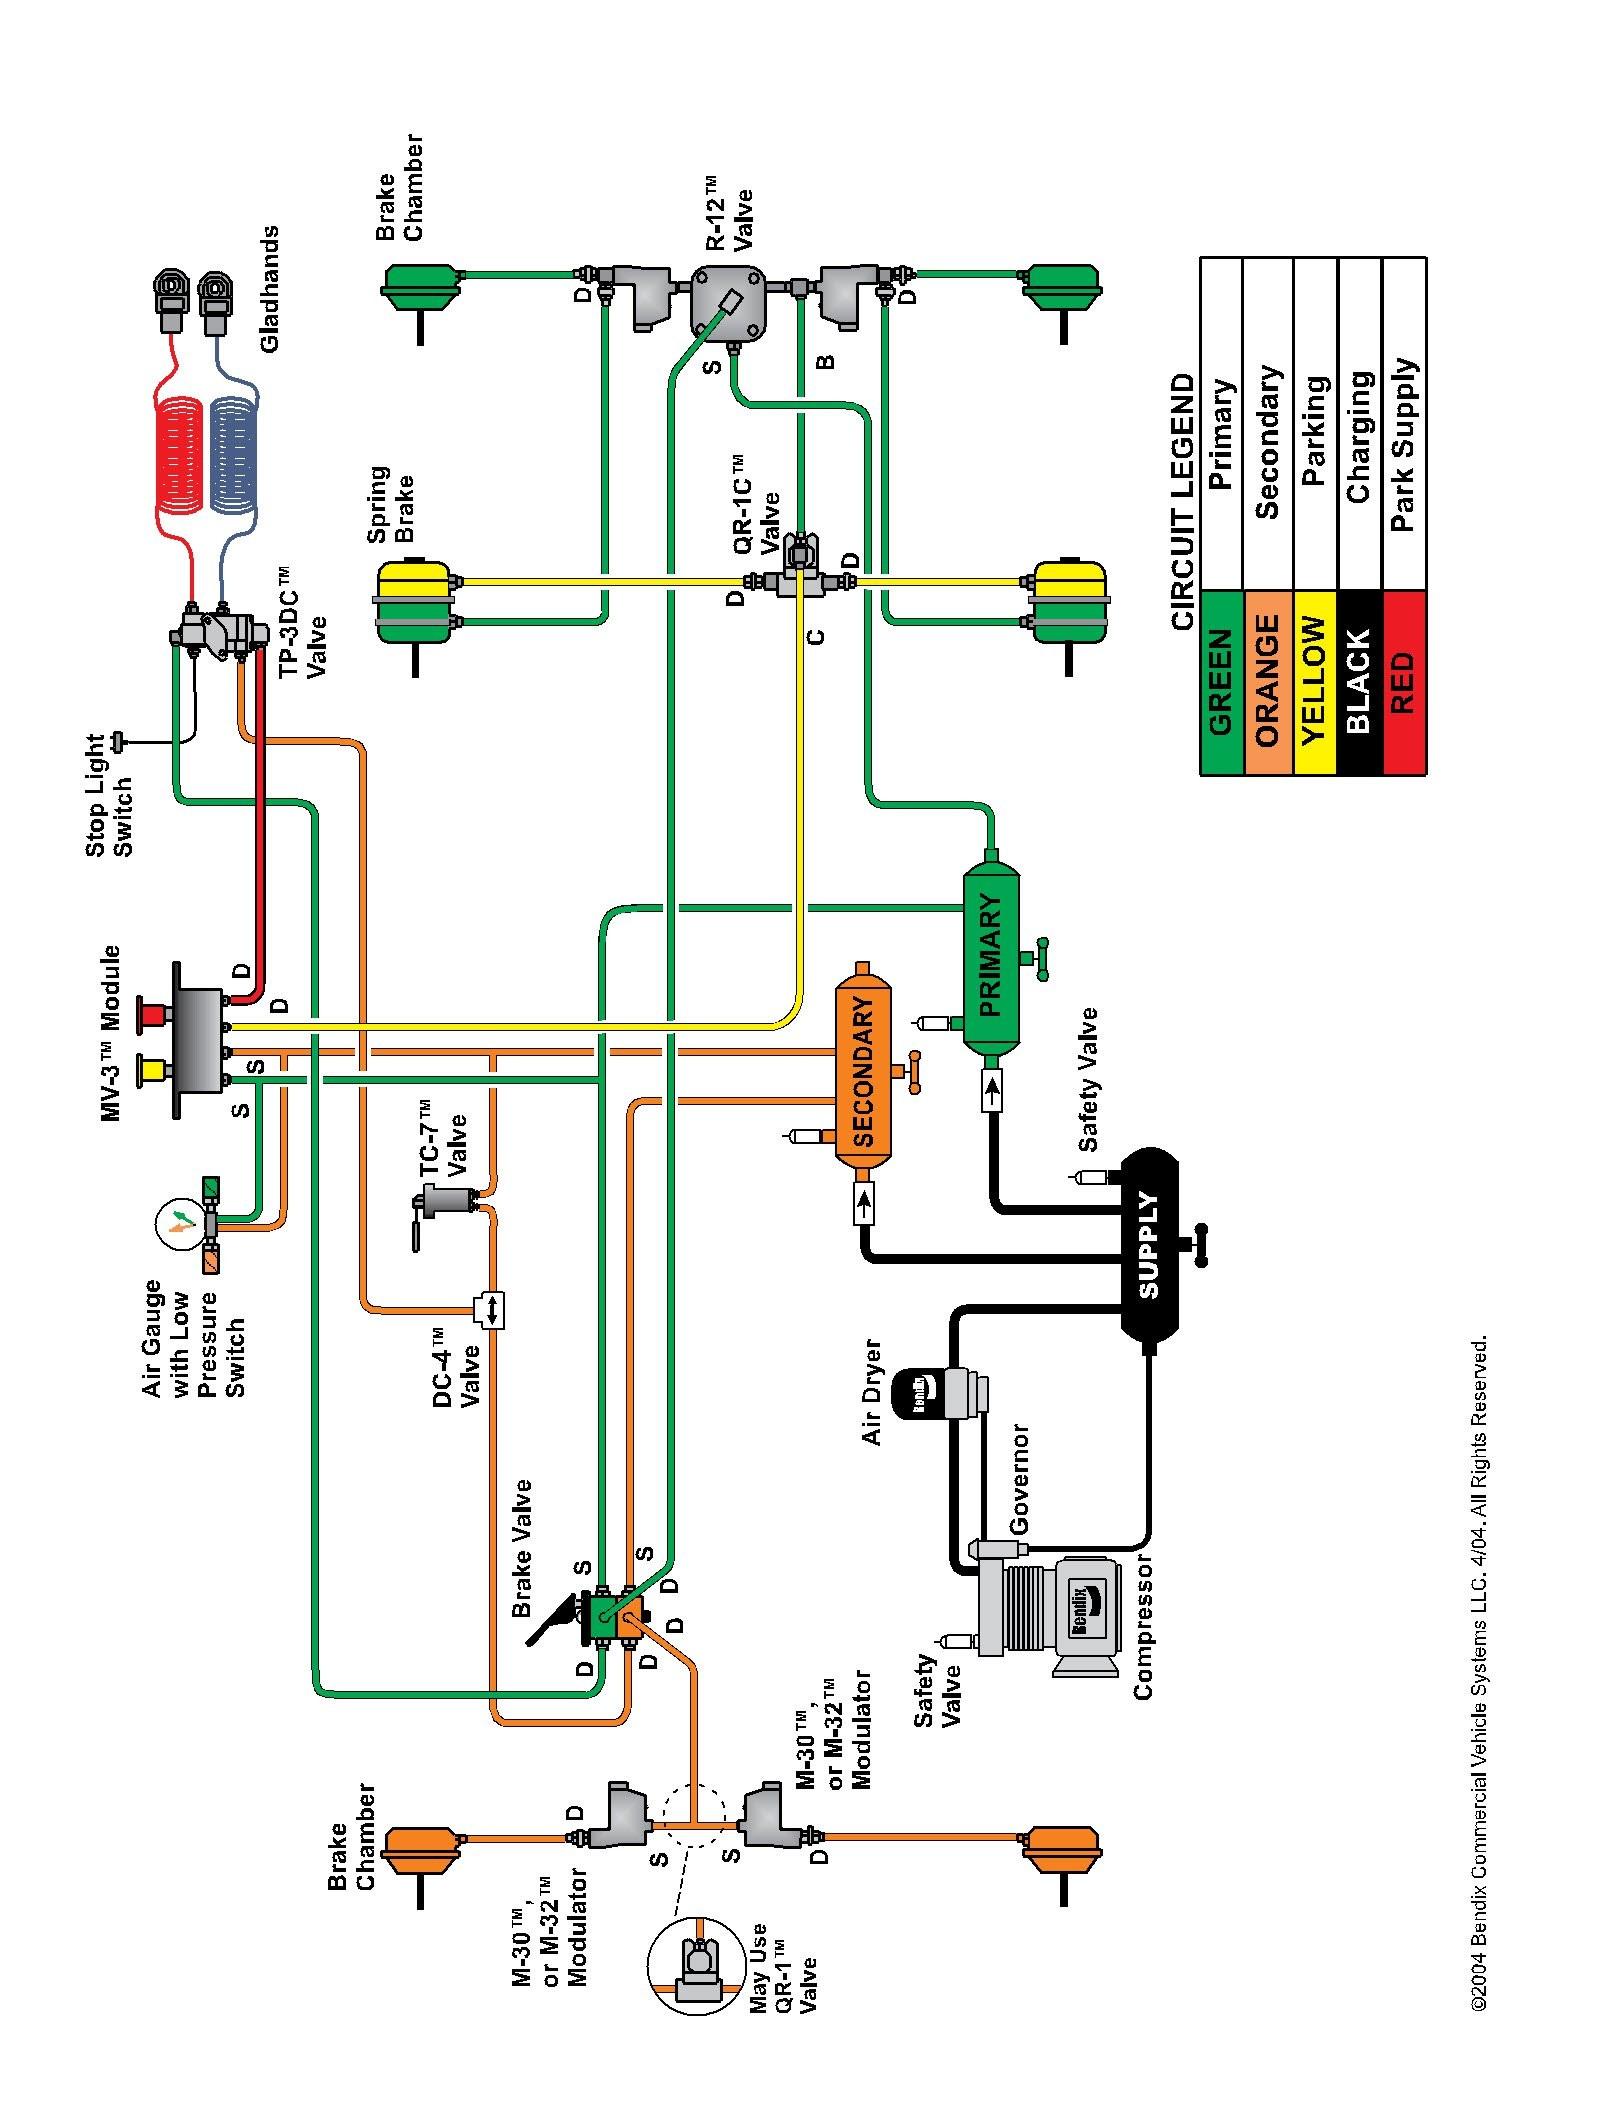 hight resolution of diesel engine fuel system diagram 7 3 powerstroke wiring diagram google search of diesel engine fuel